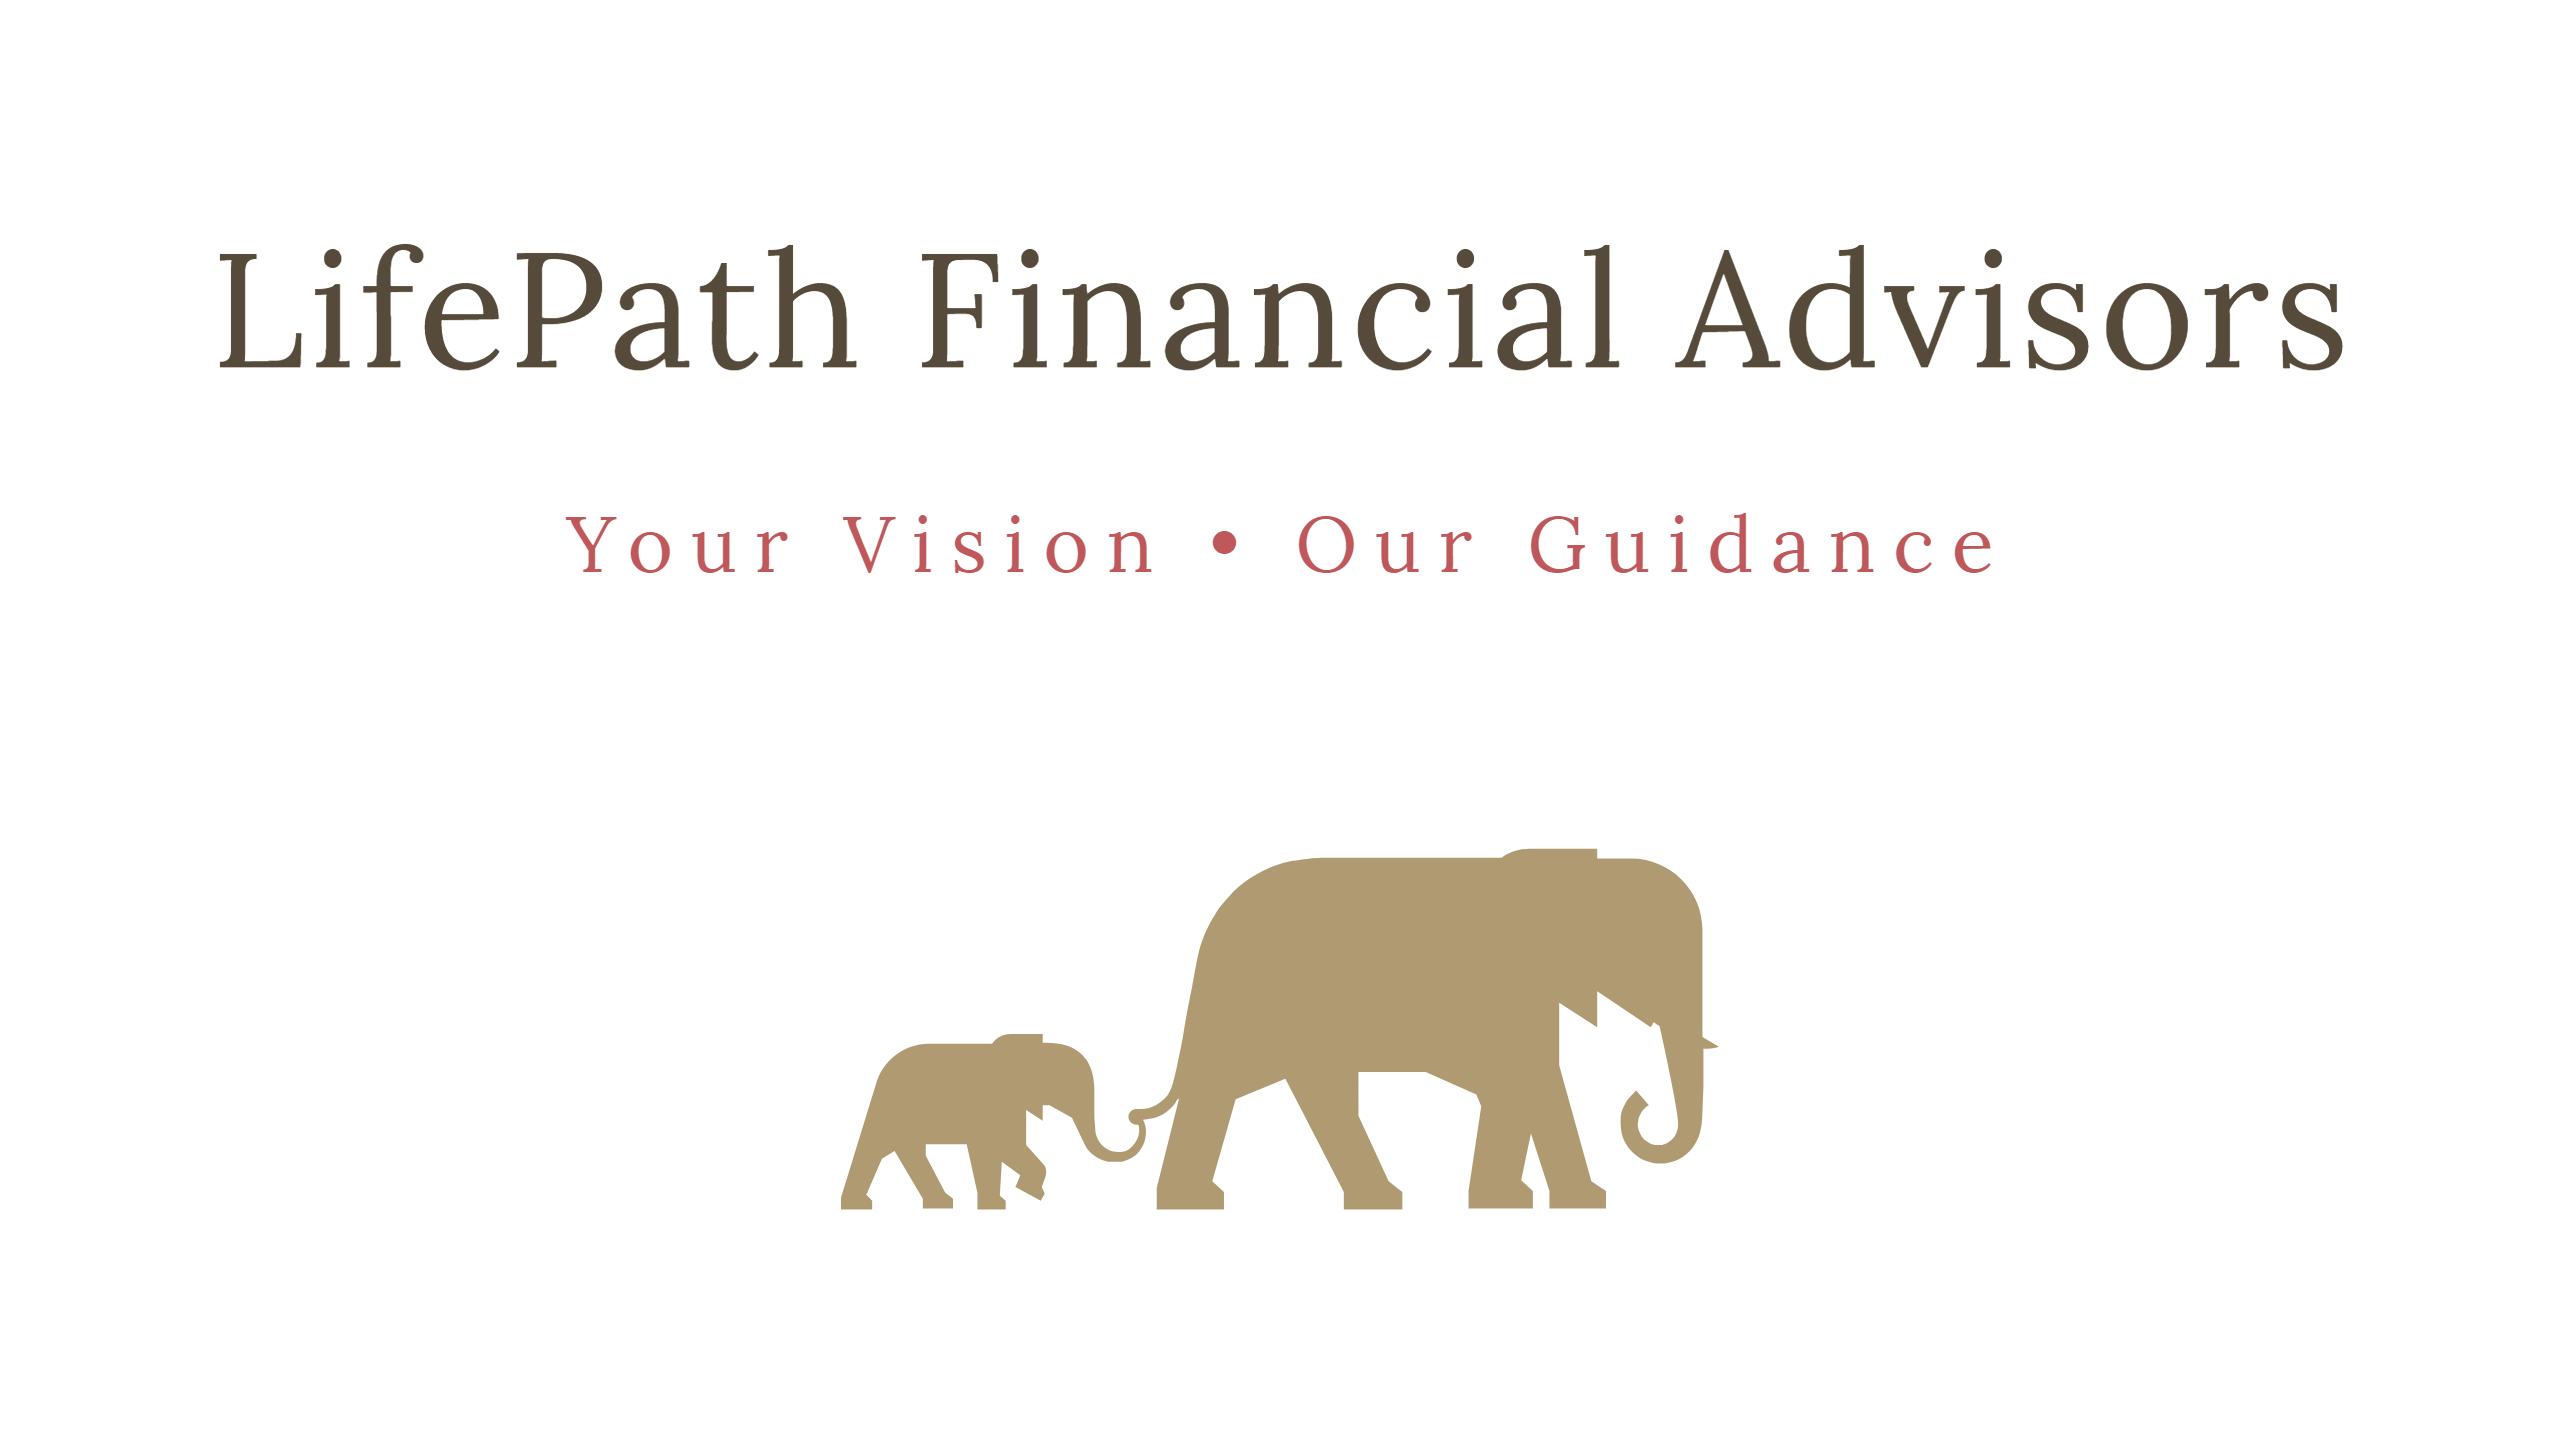 LifePath Financial Advisors